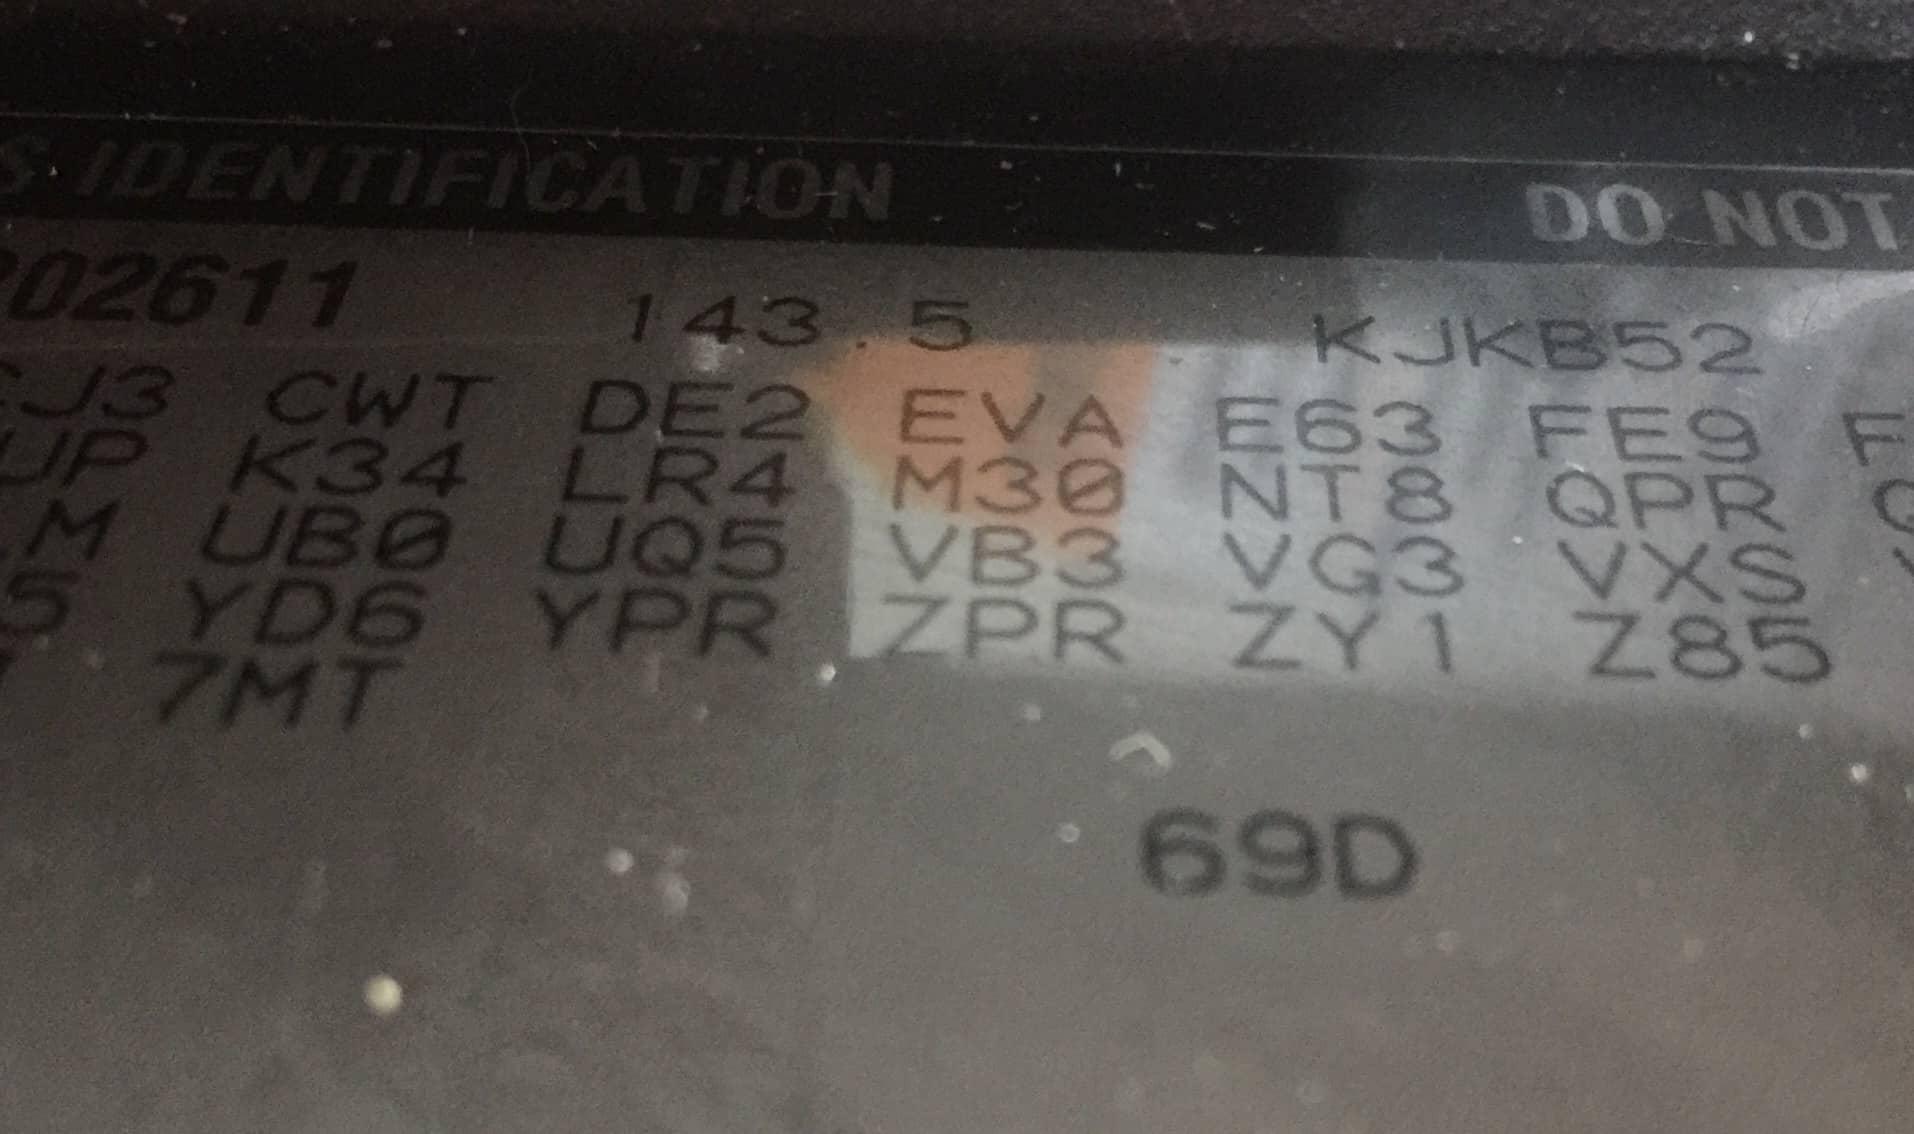 2004 Trailblazer Transmission | Drivetrain Resource